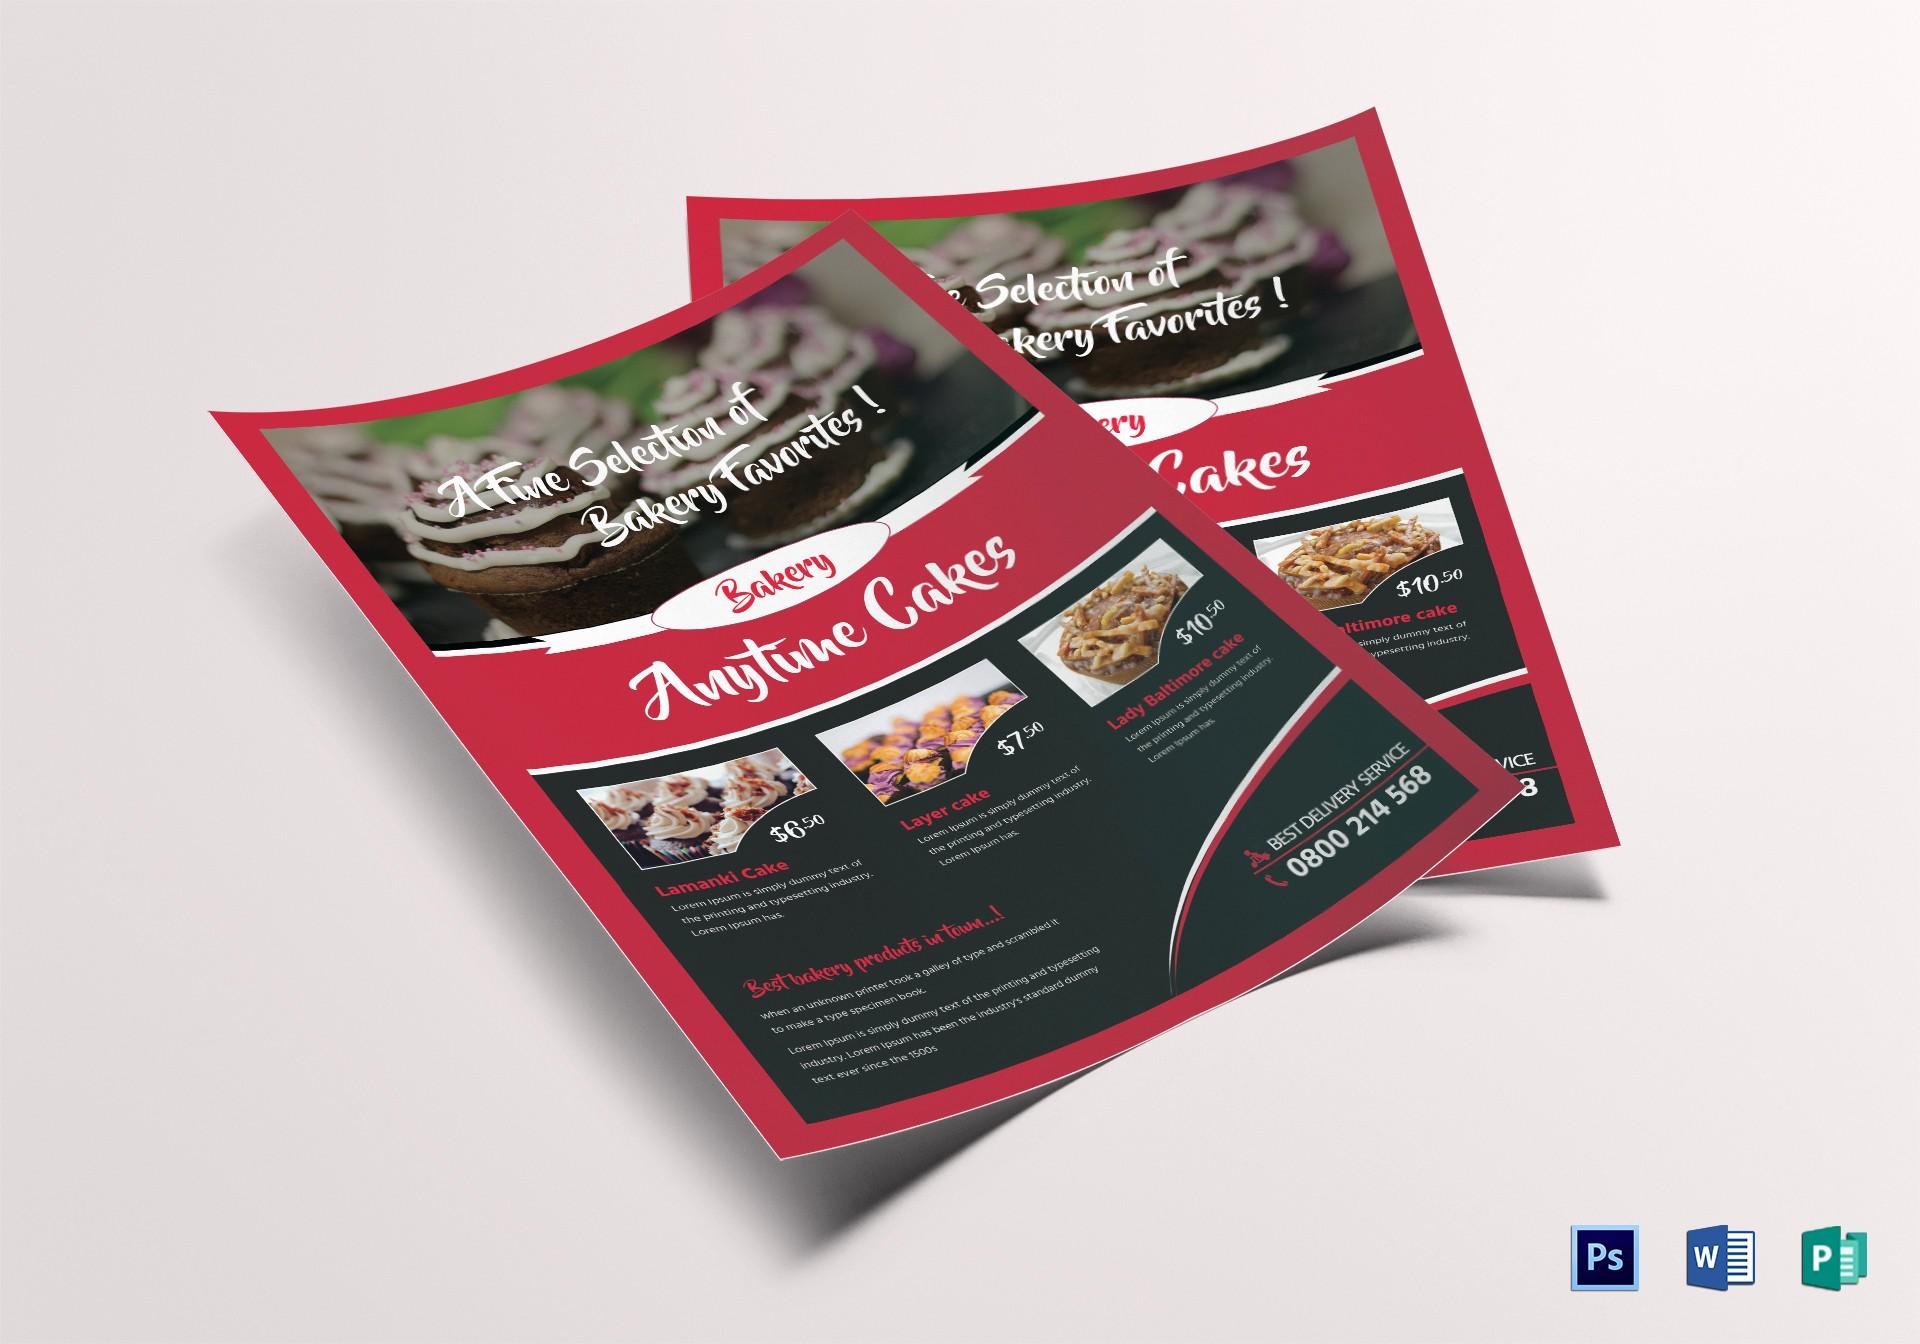 Bake Sale Flyer Template Word Lovely Customizable Bake Sale Flyer Design Template In Psd Word